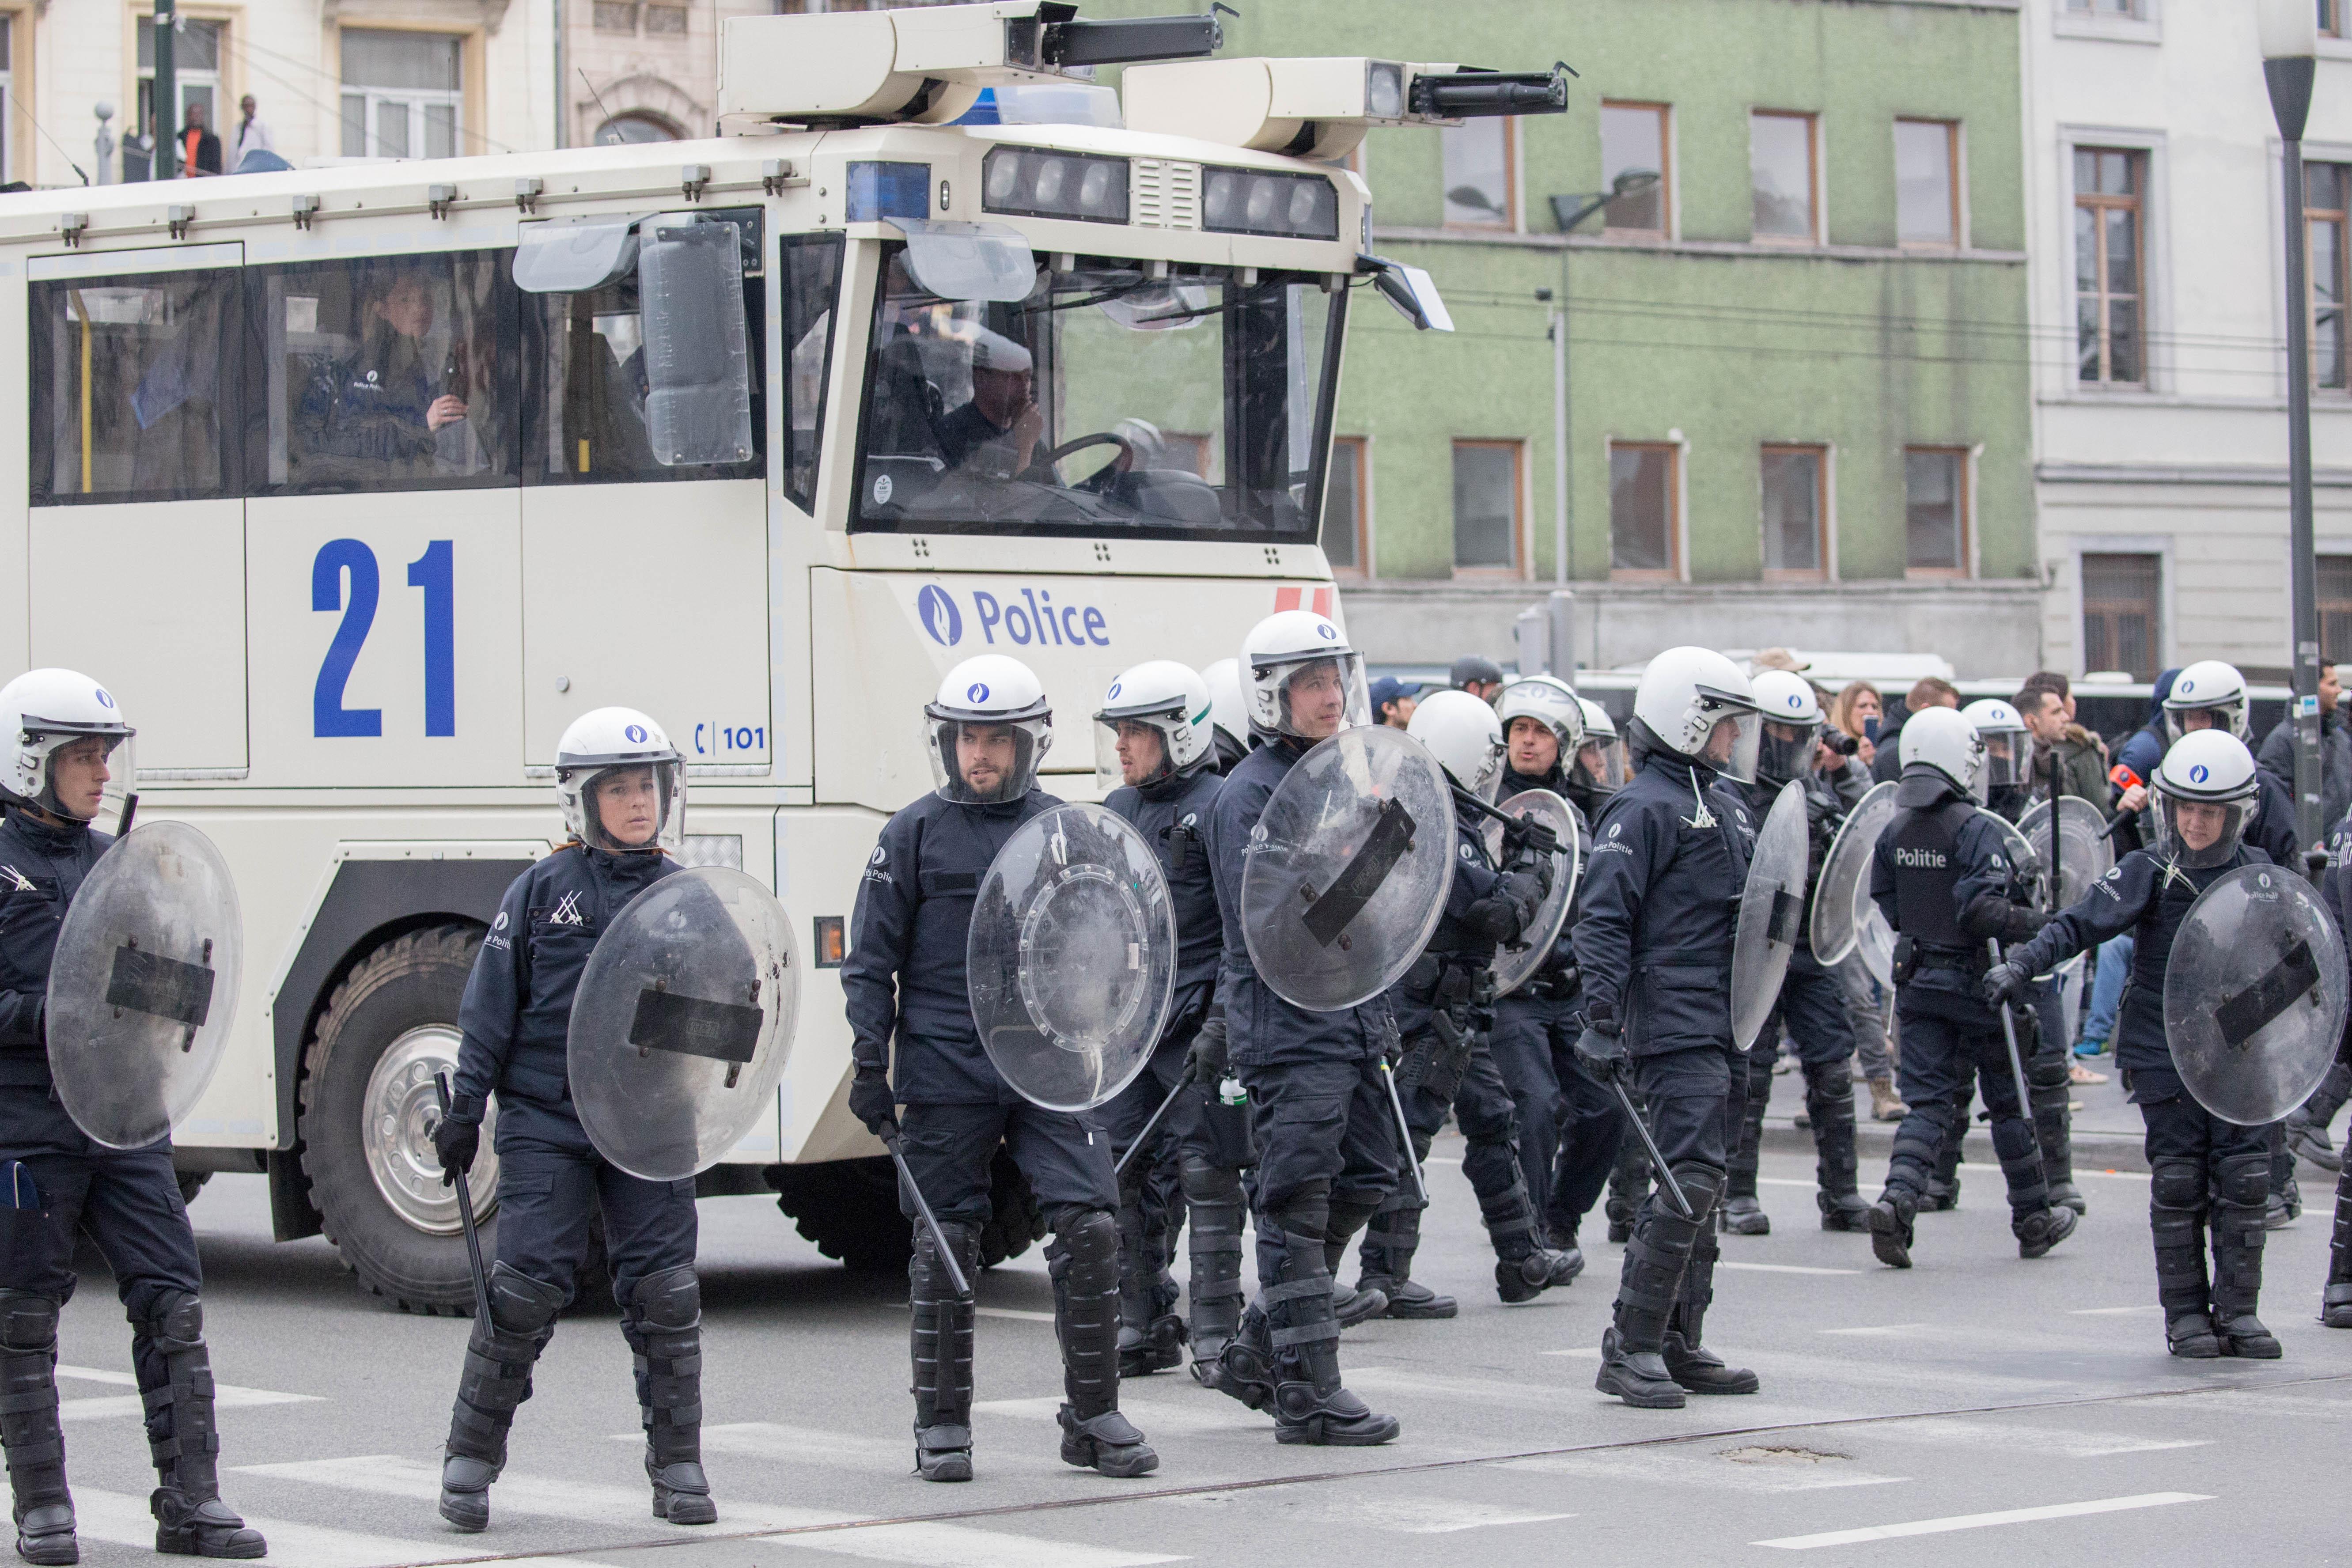 Proteste violente la Bruxelles. Mai multi extremisti de dreapta si antirasisti au fost retinuti de politie. VIDEO